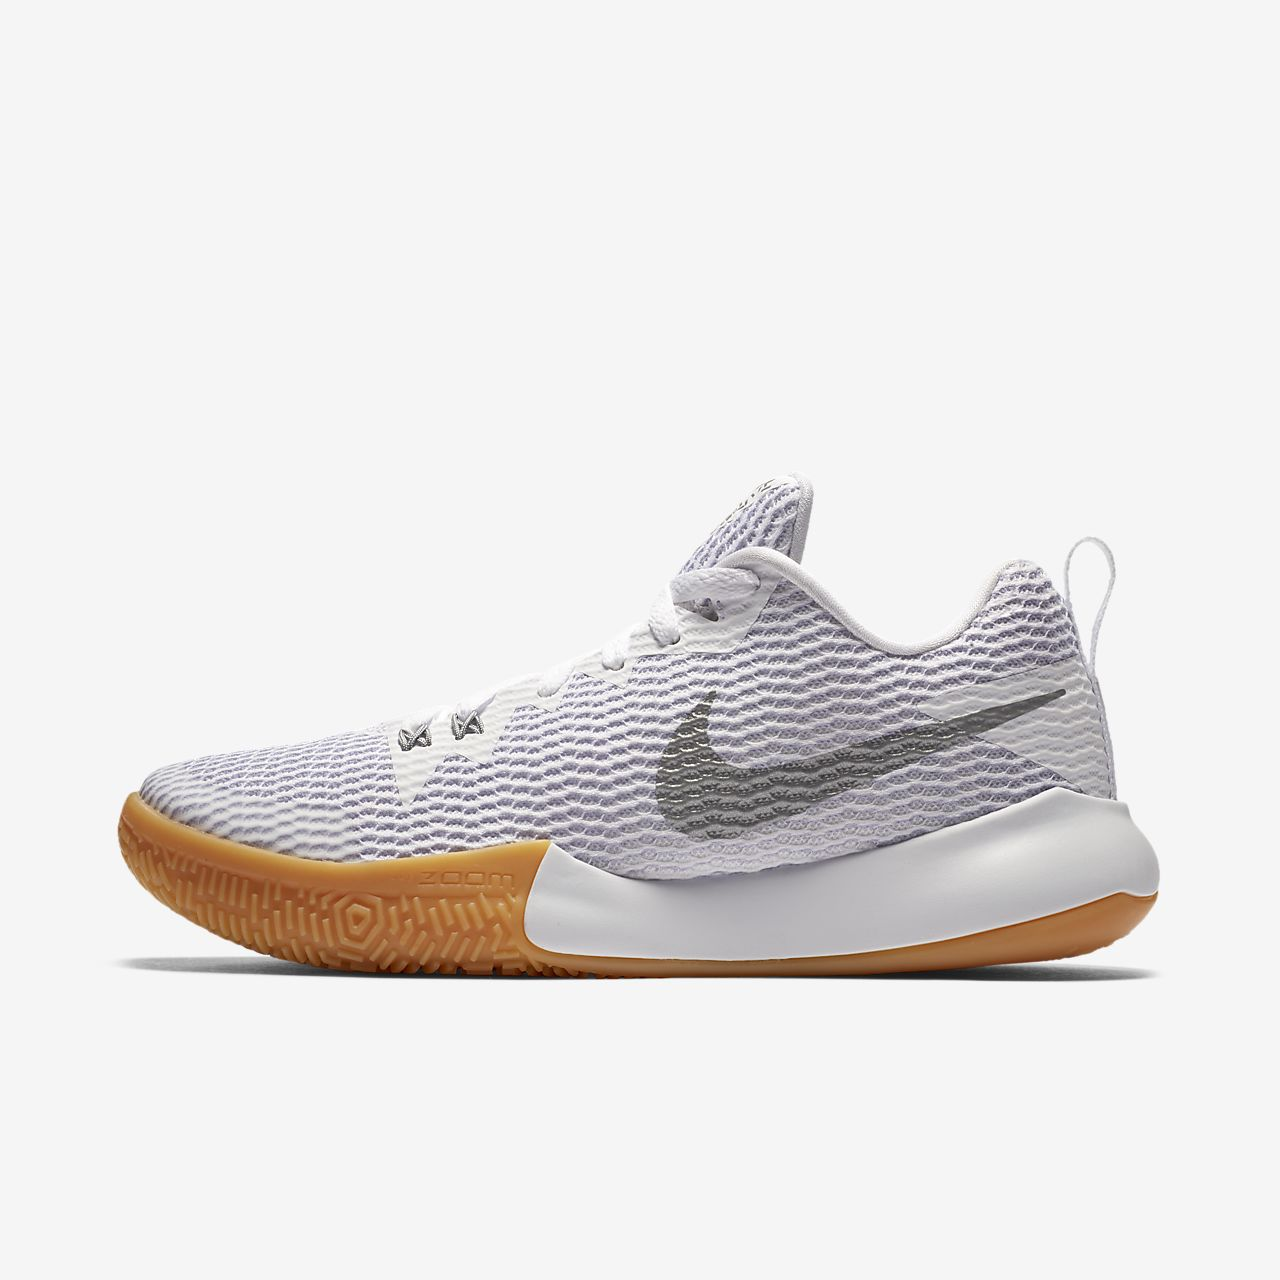 2e8c57a301e Nike Zoom Live II Zapatillas de baloncesto - Mujer. Nike.com ES